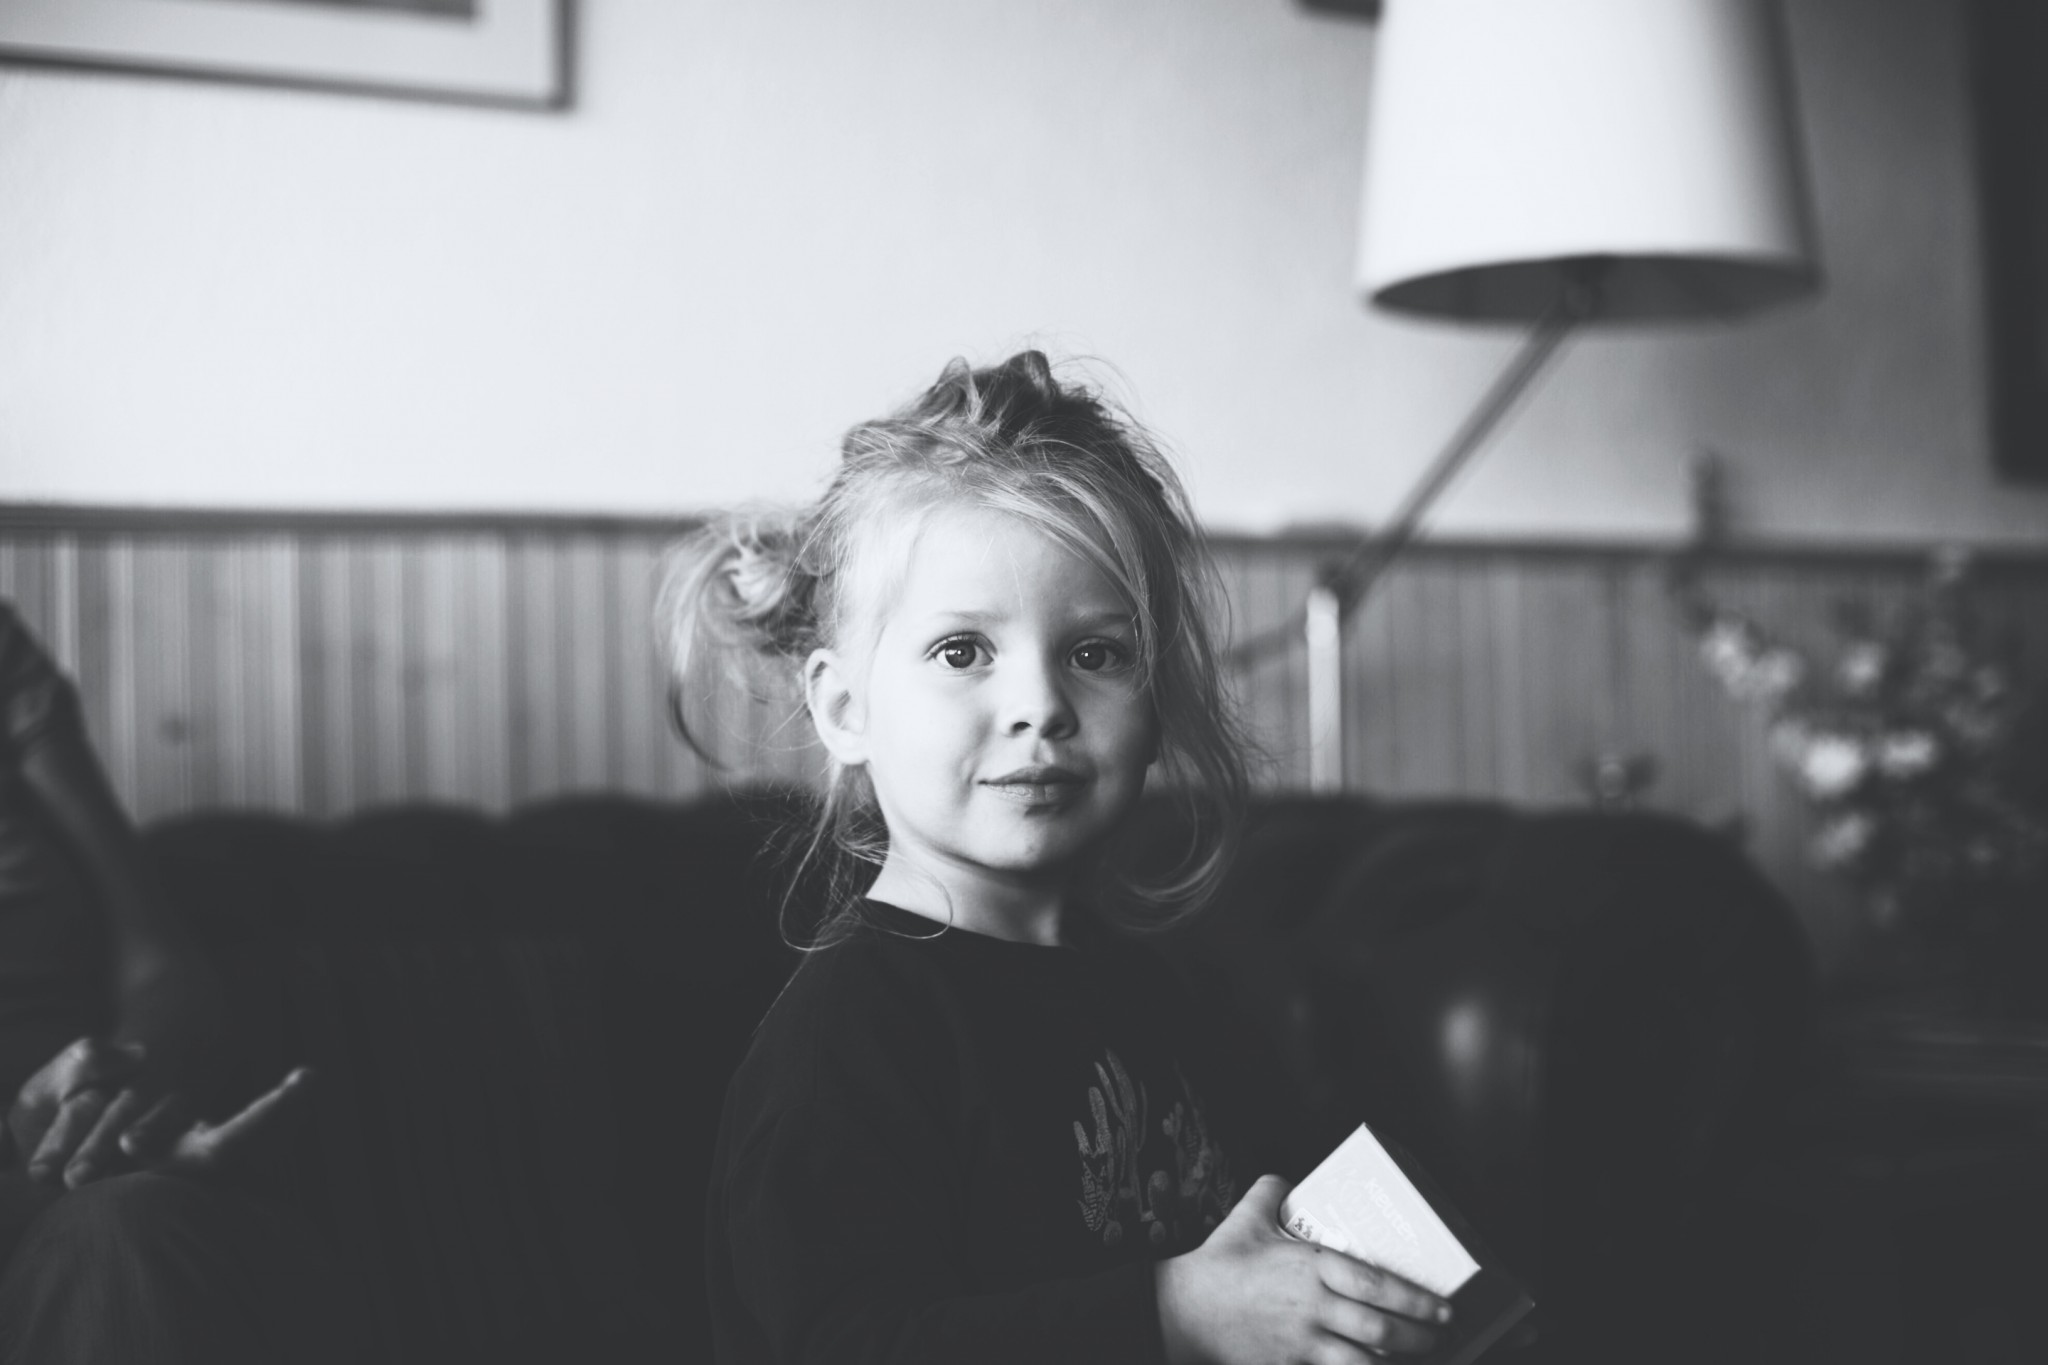 25/52 Madelon. 52 project. Each kid. One photo. Every week.